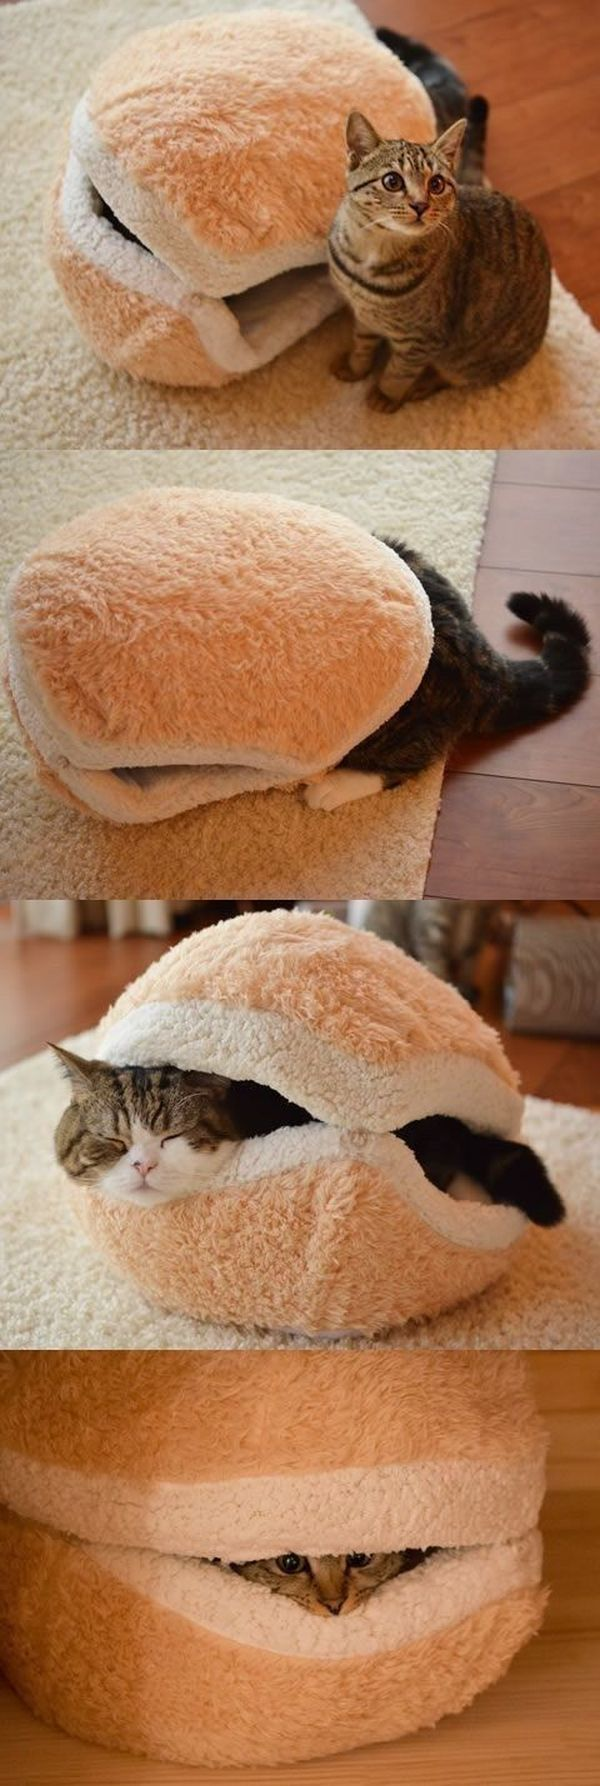 Cat Burger - Cat humor